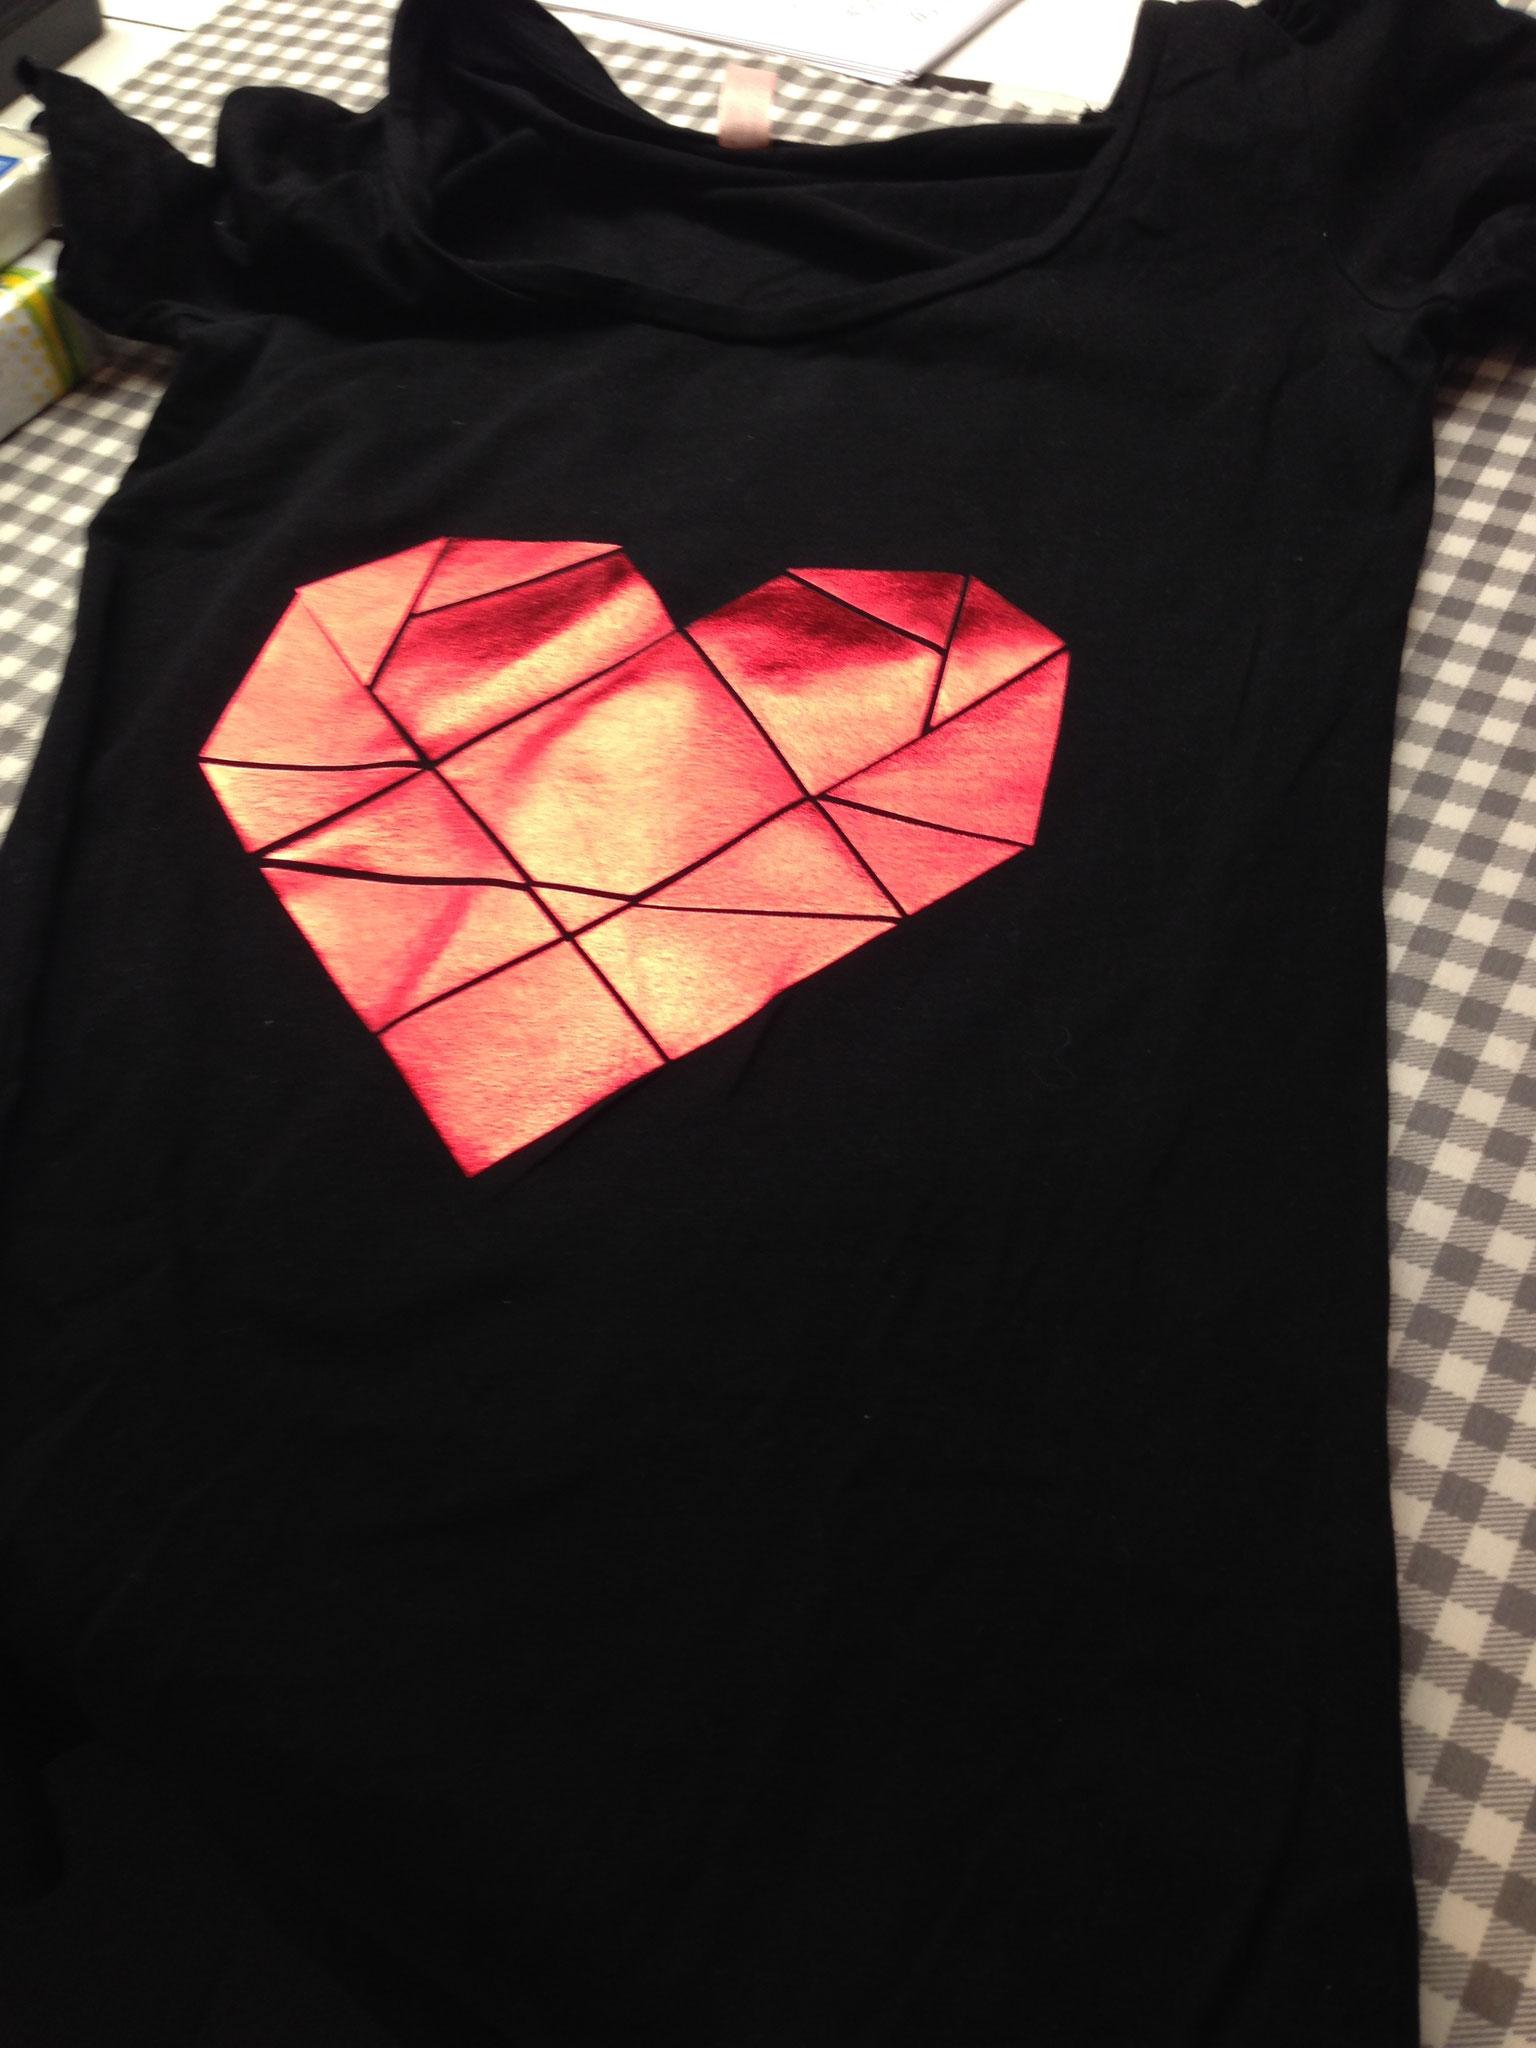 bedrucktes/geklebtes Shirt